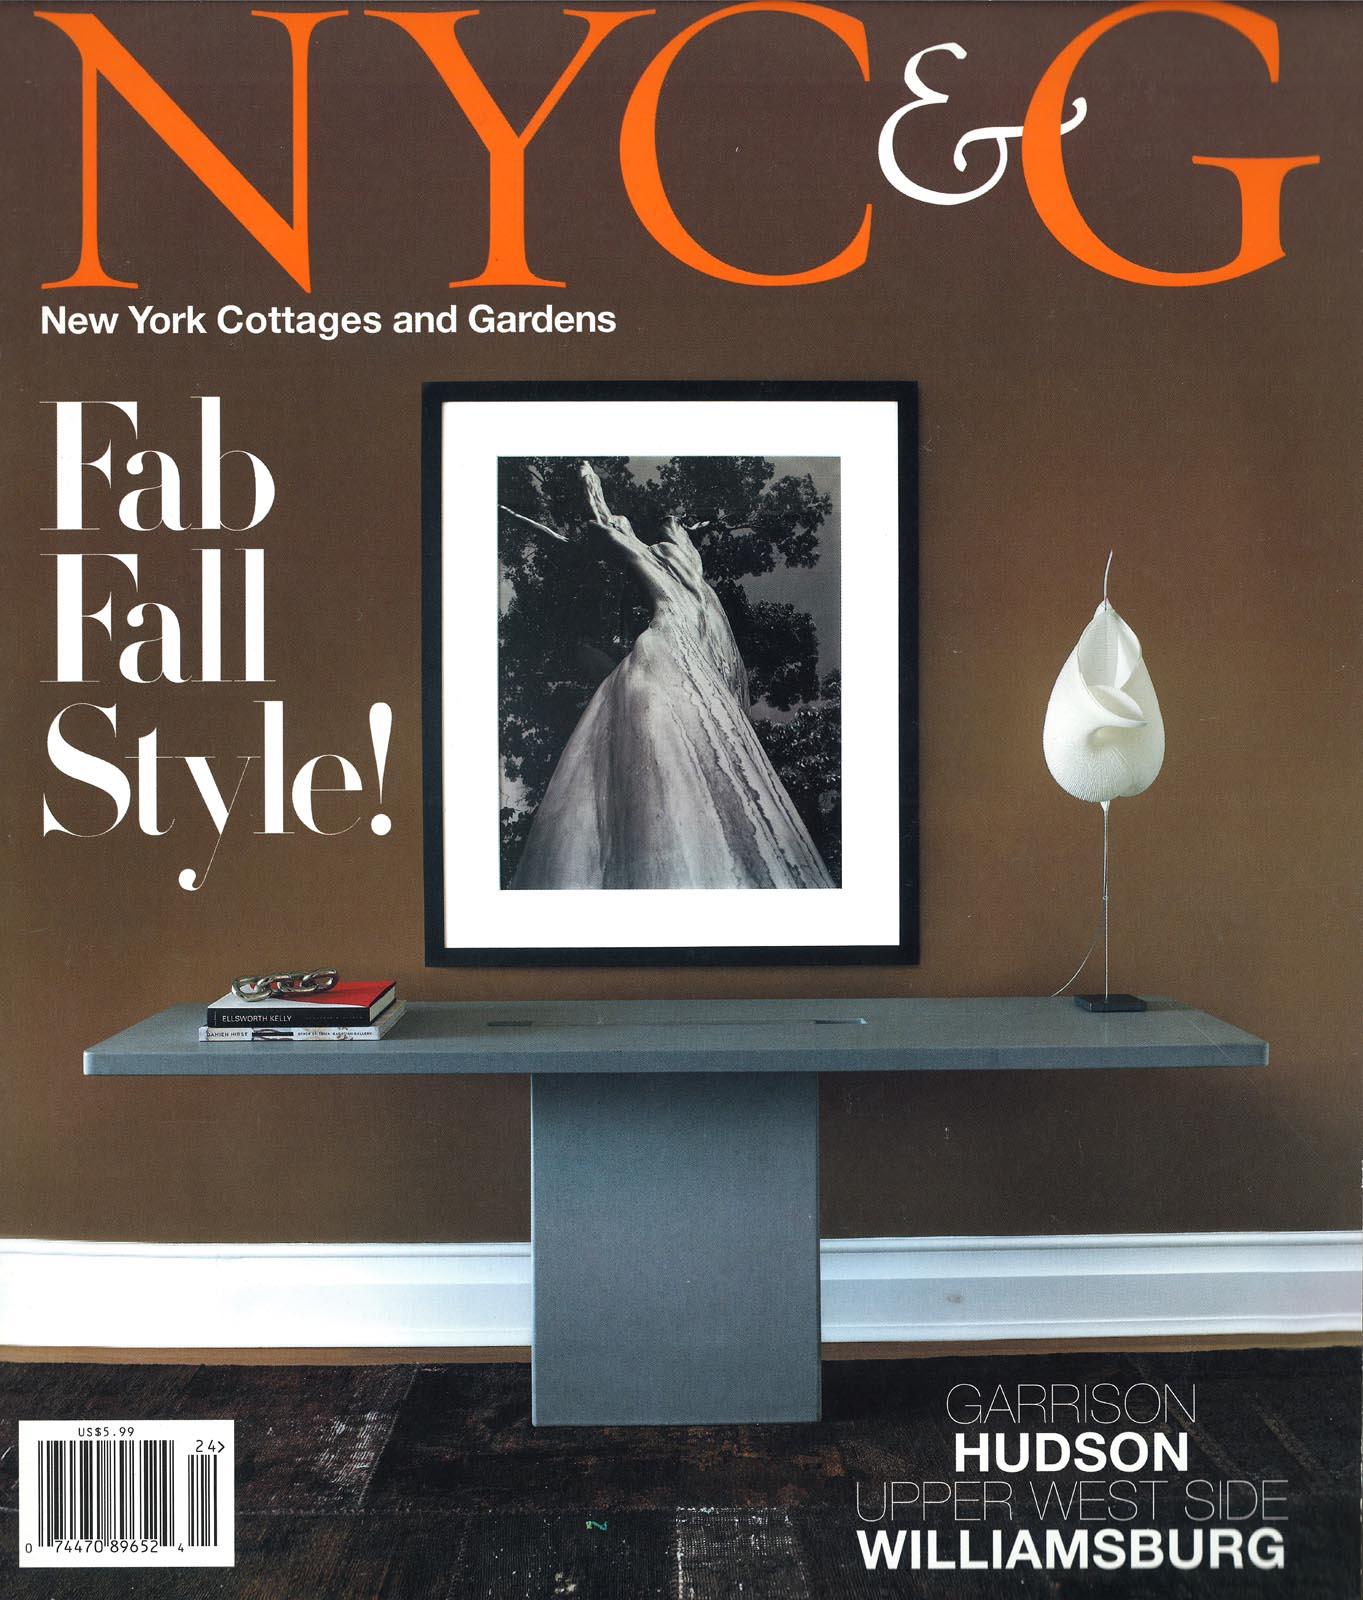 00-NYCG_cover.jpg